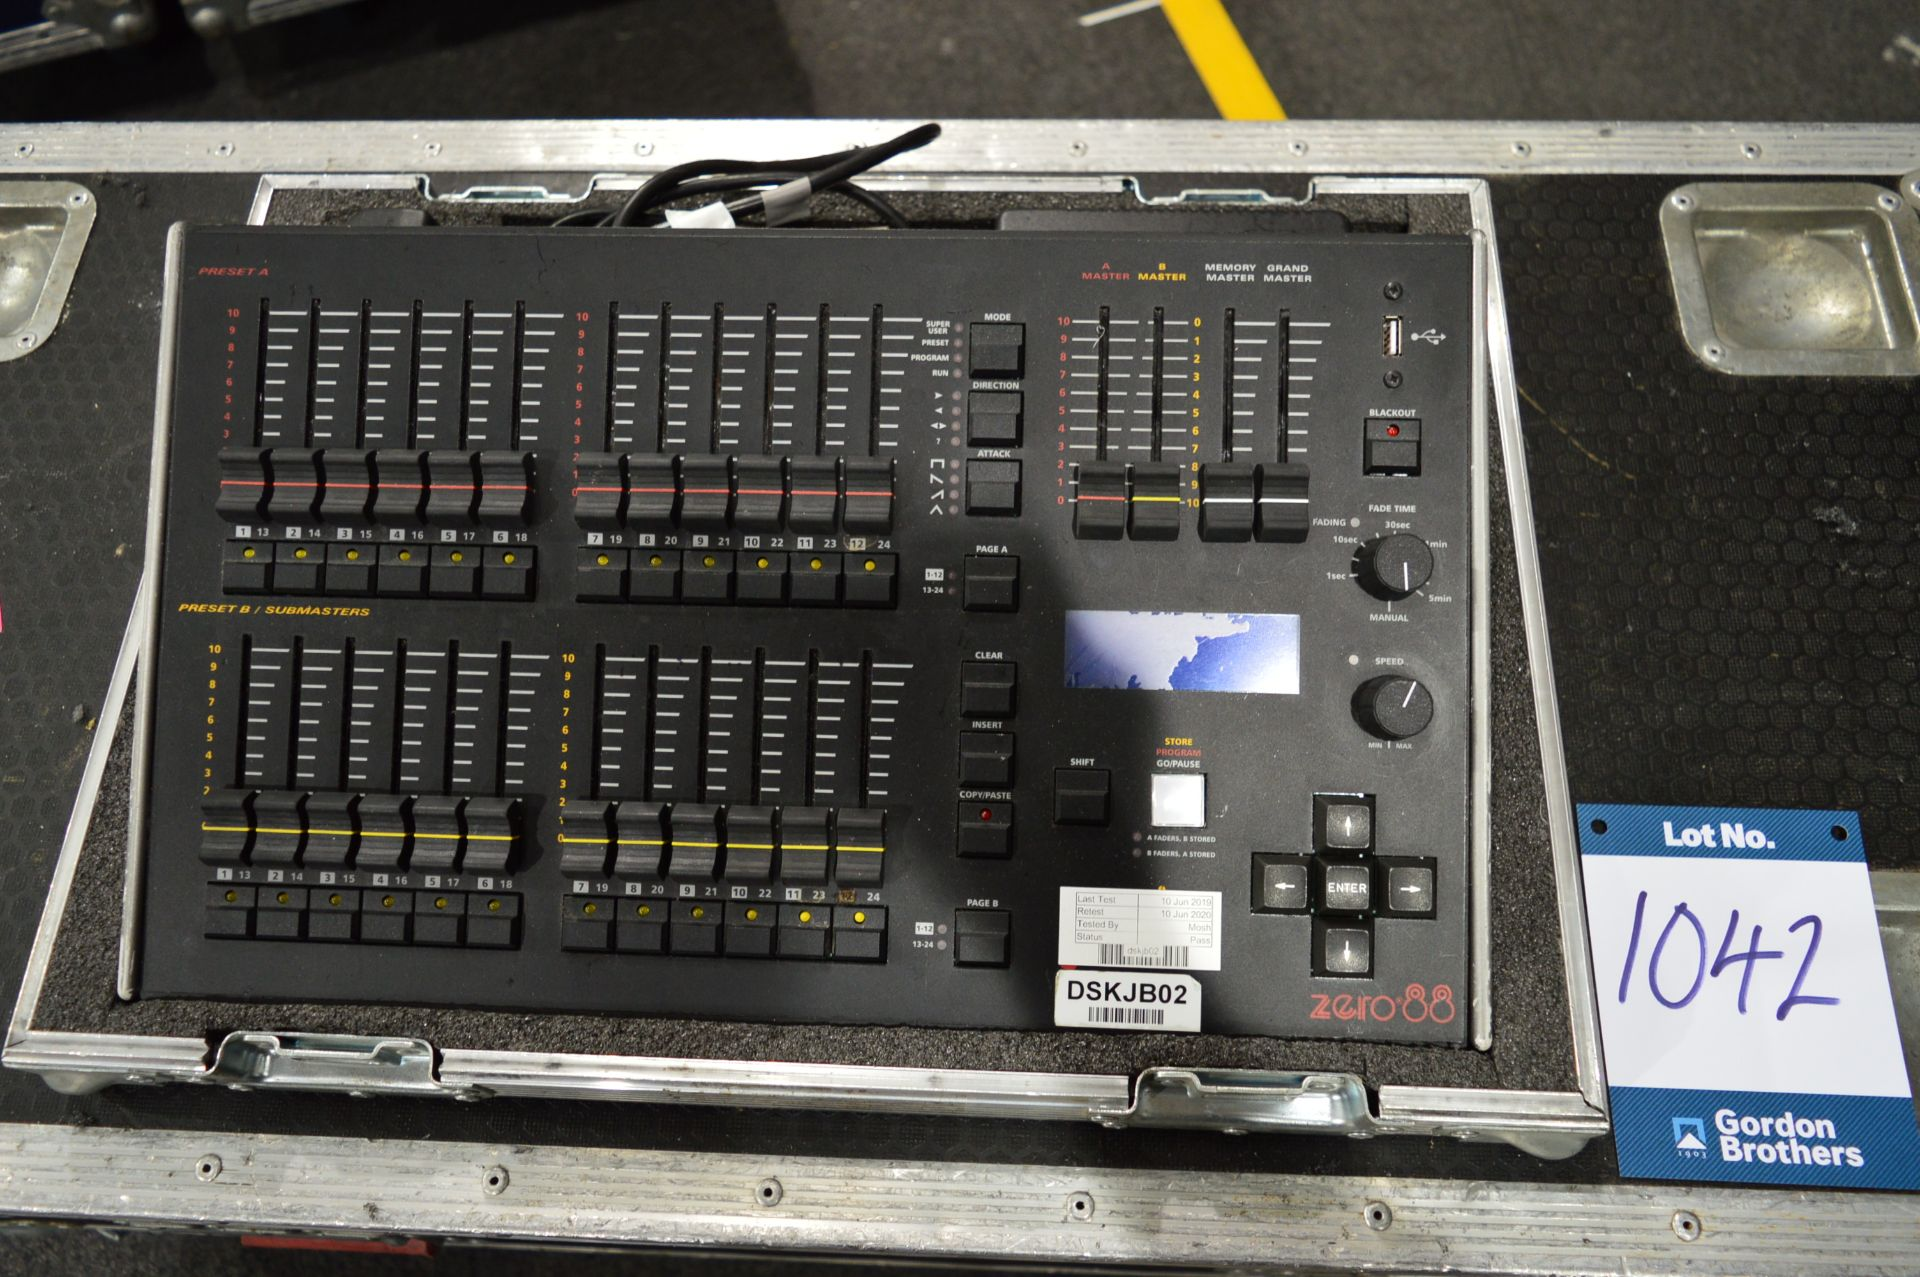 Lot 1042 - Zero88, Jester 12/24 lighting console controller,